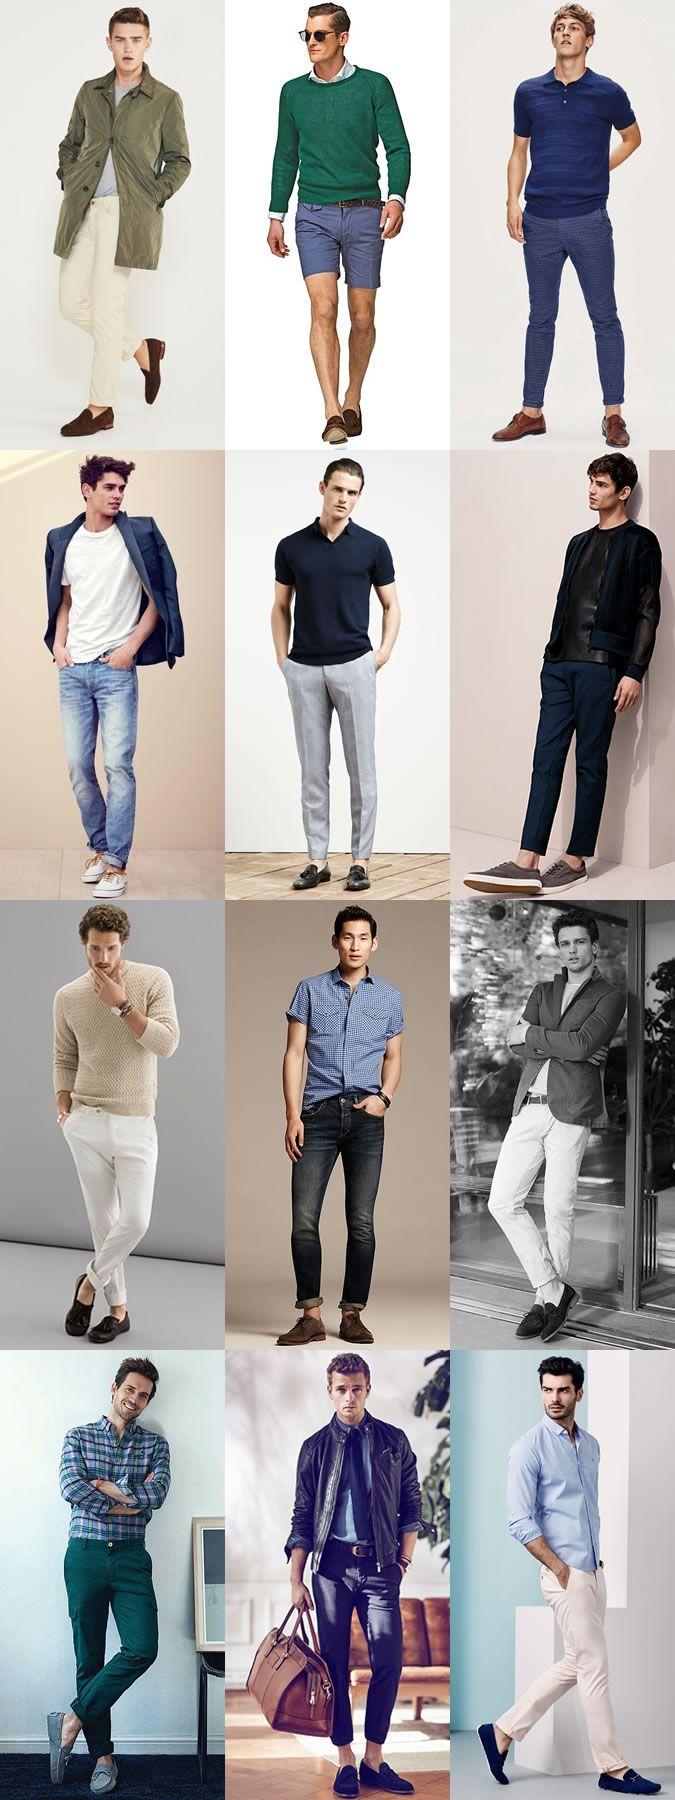 Men's Spring/Summer Sockless Outfit Inspiration Lookbook